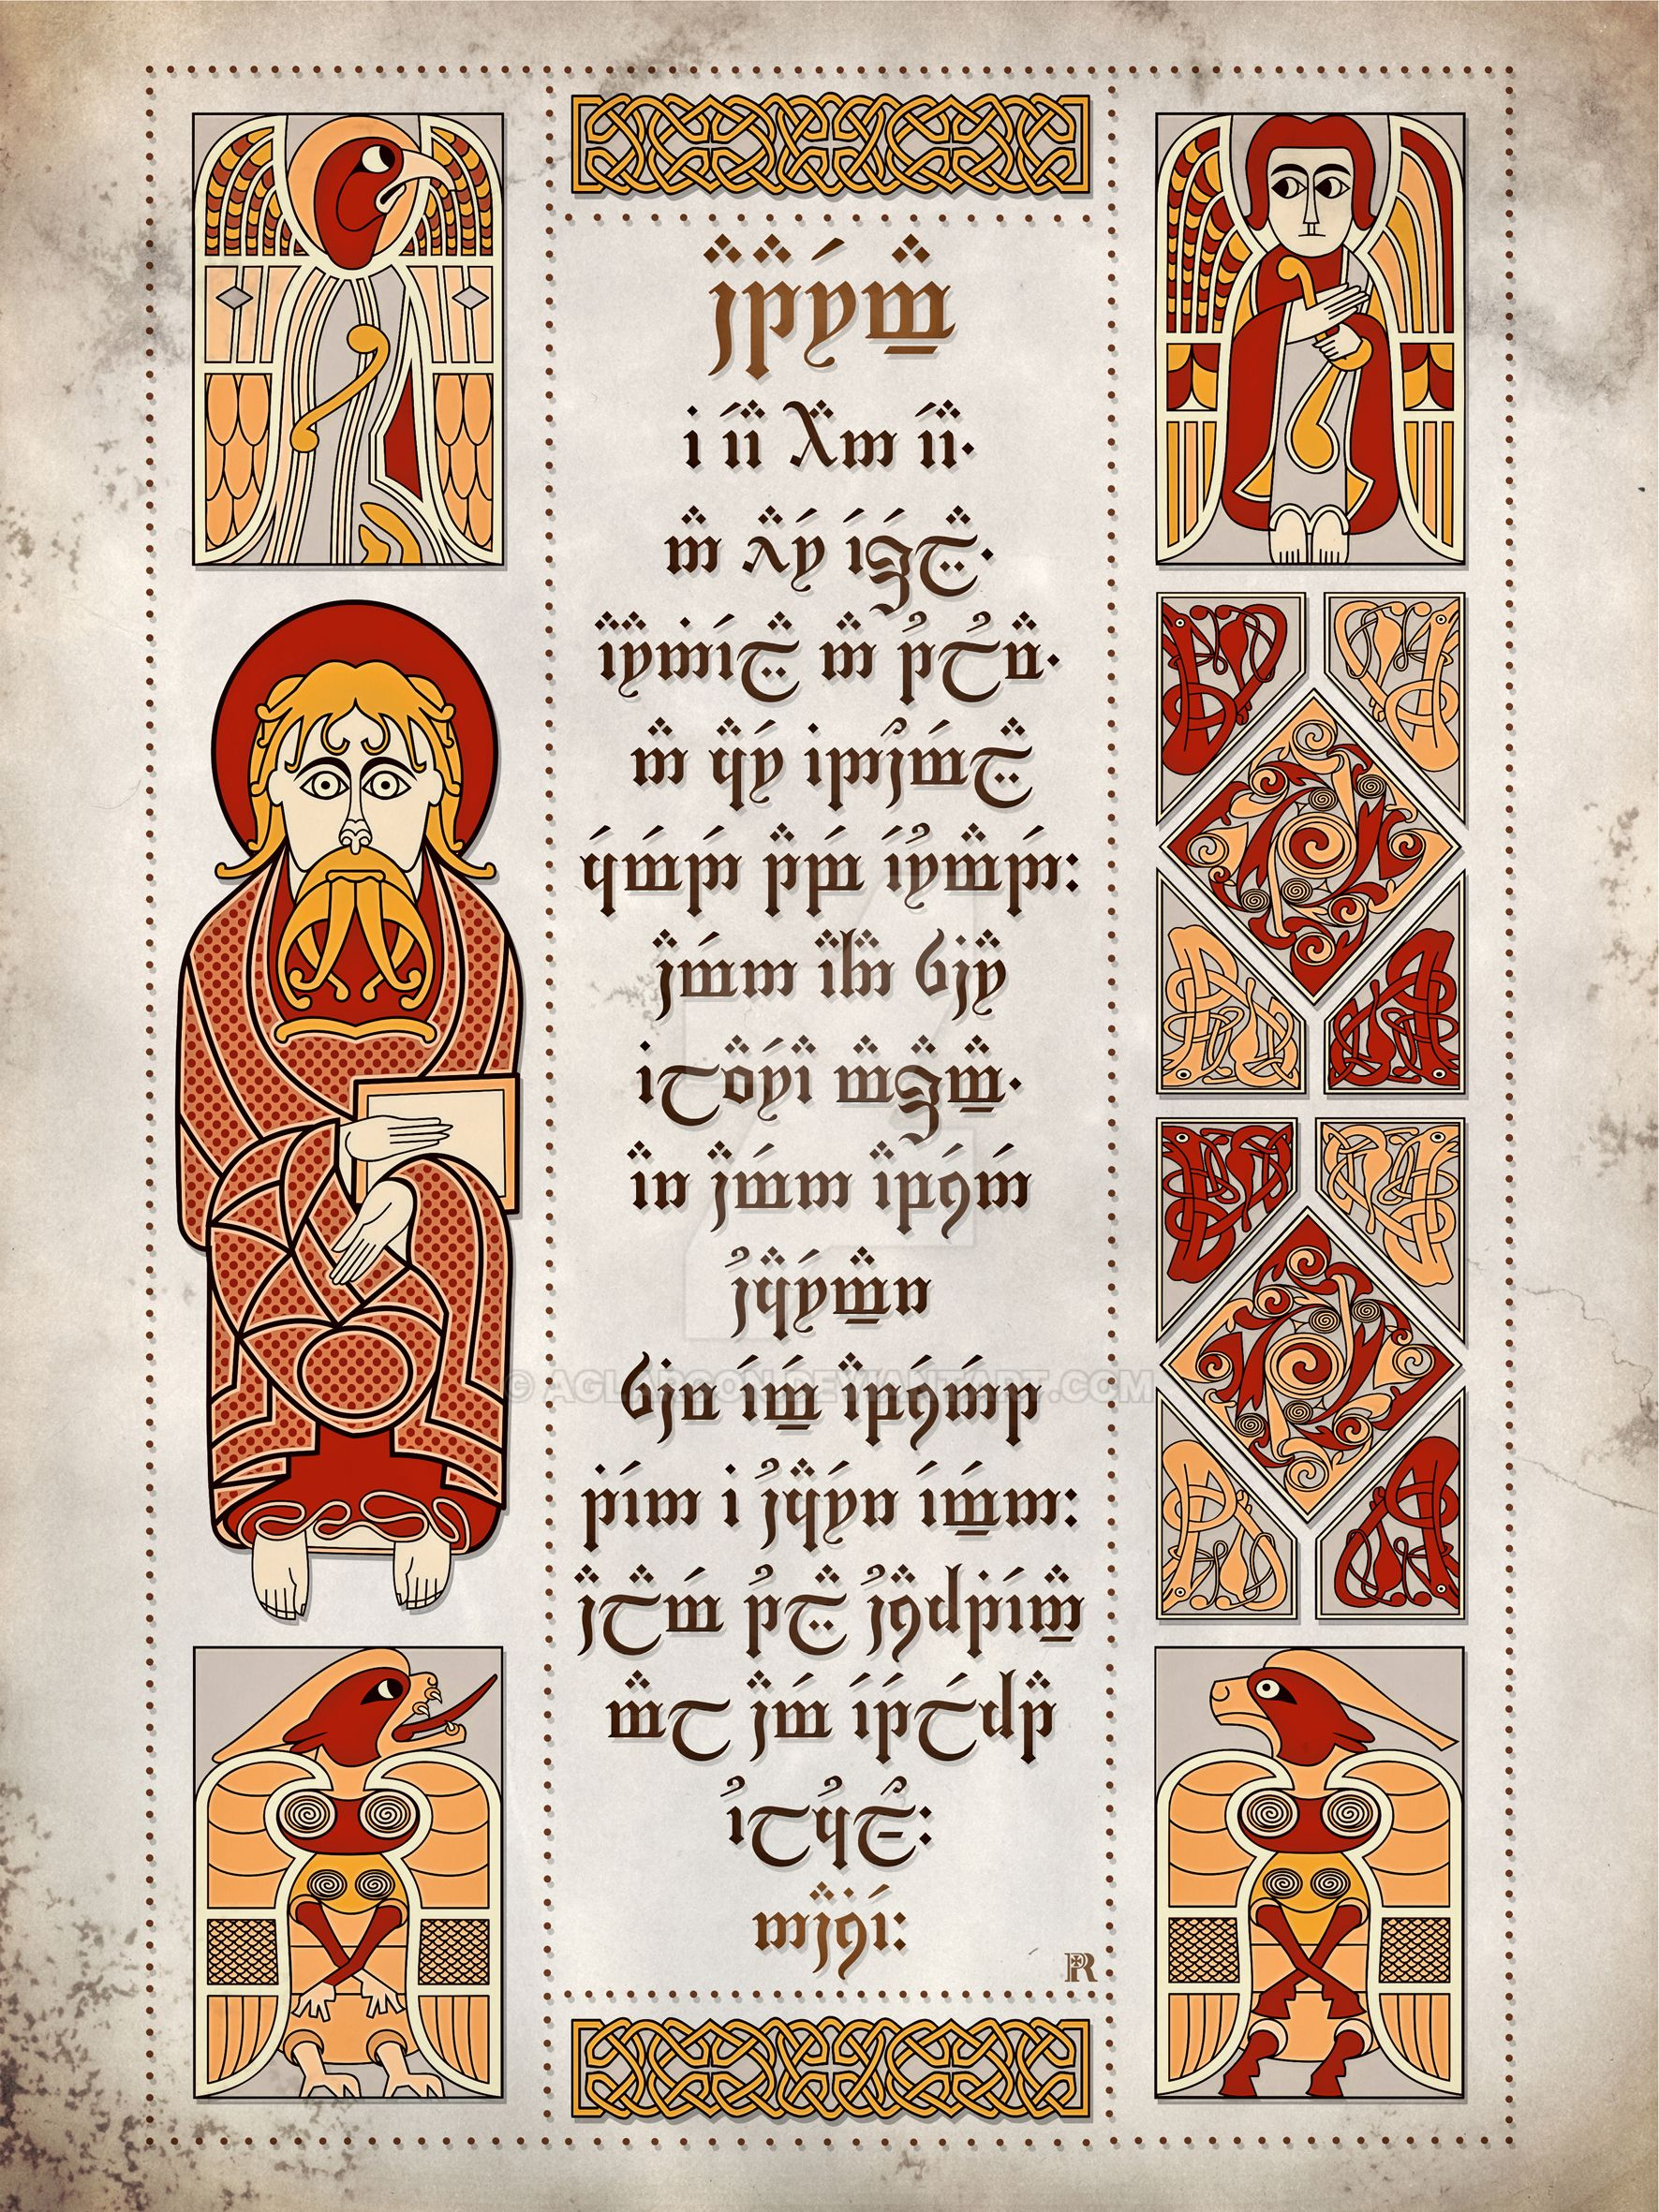 Ataremma VI - The Lords Prayer in Quenya Tolkien by Aglargon